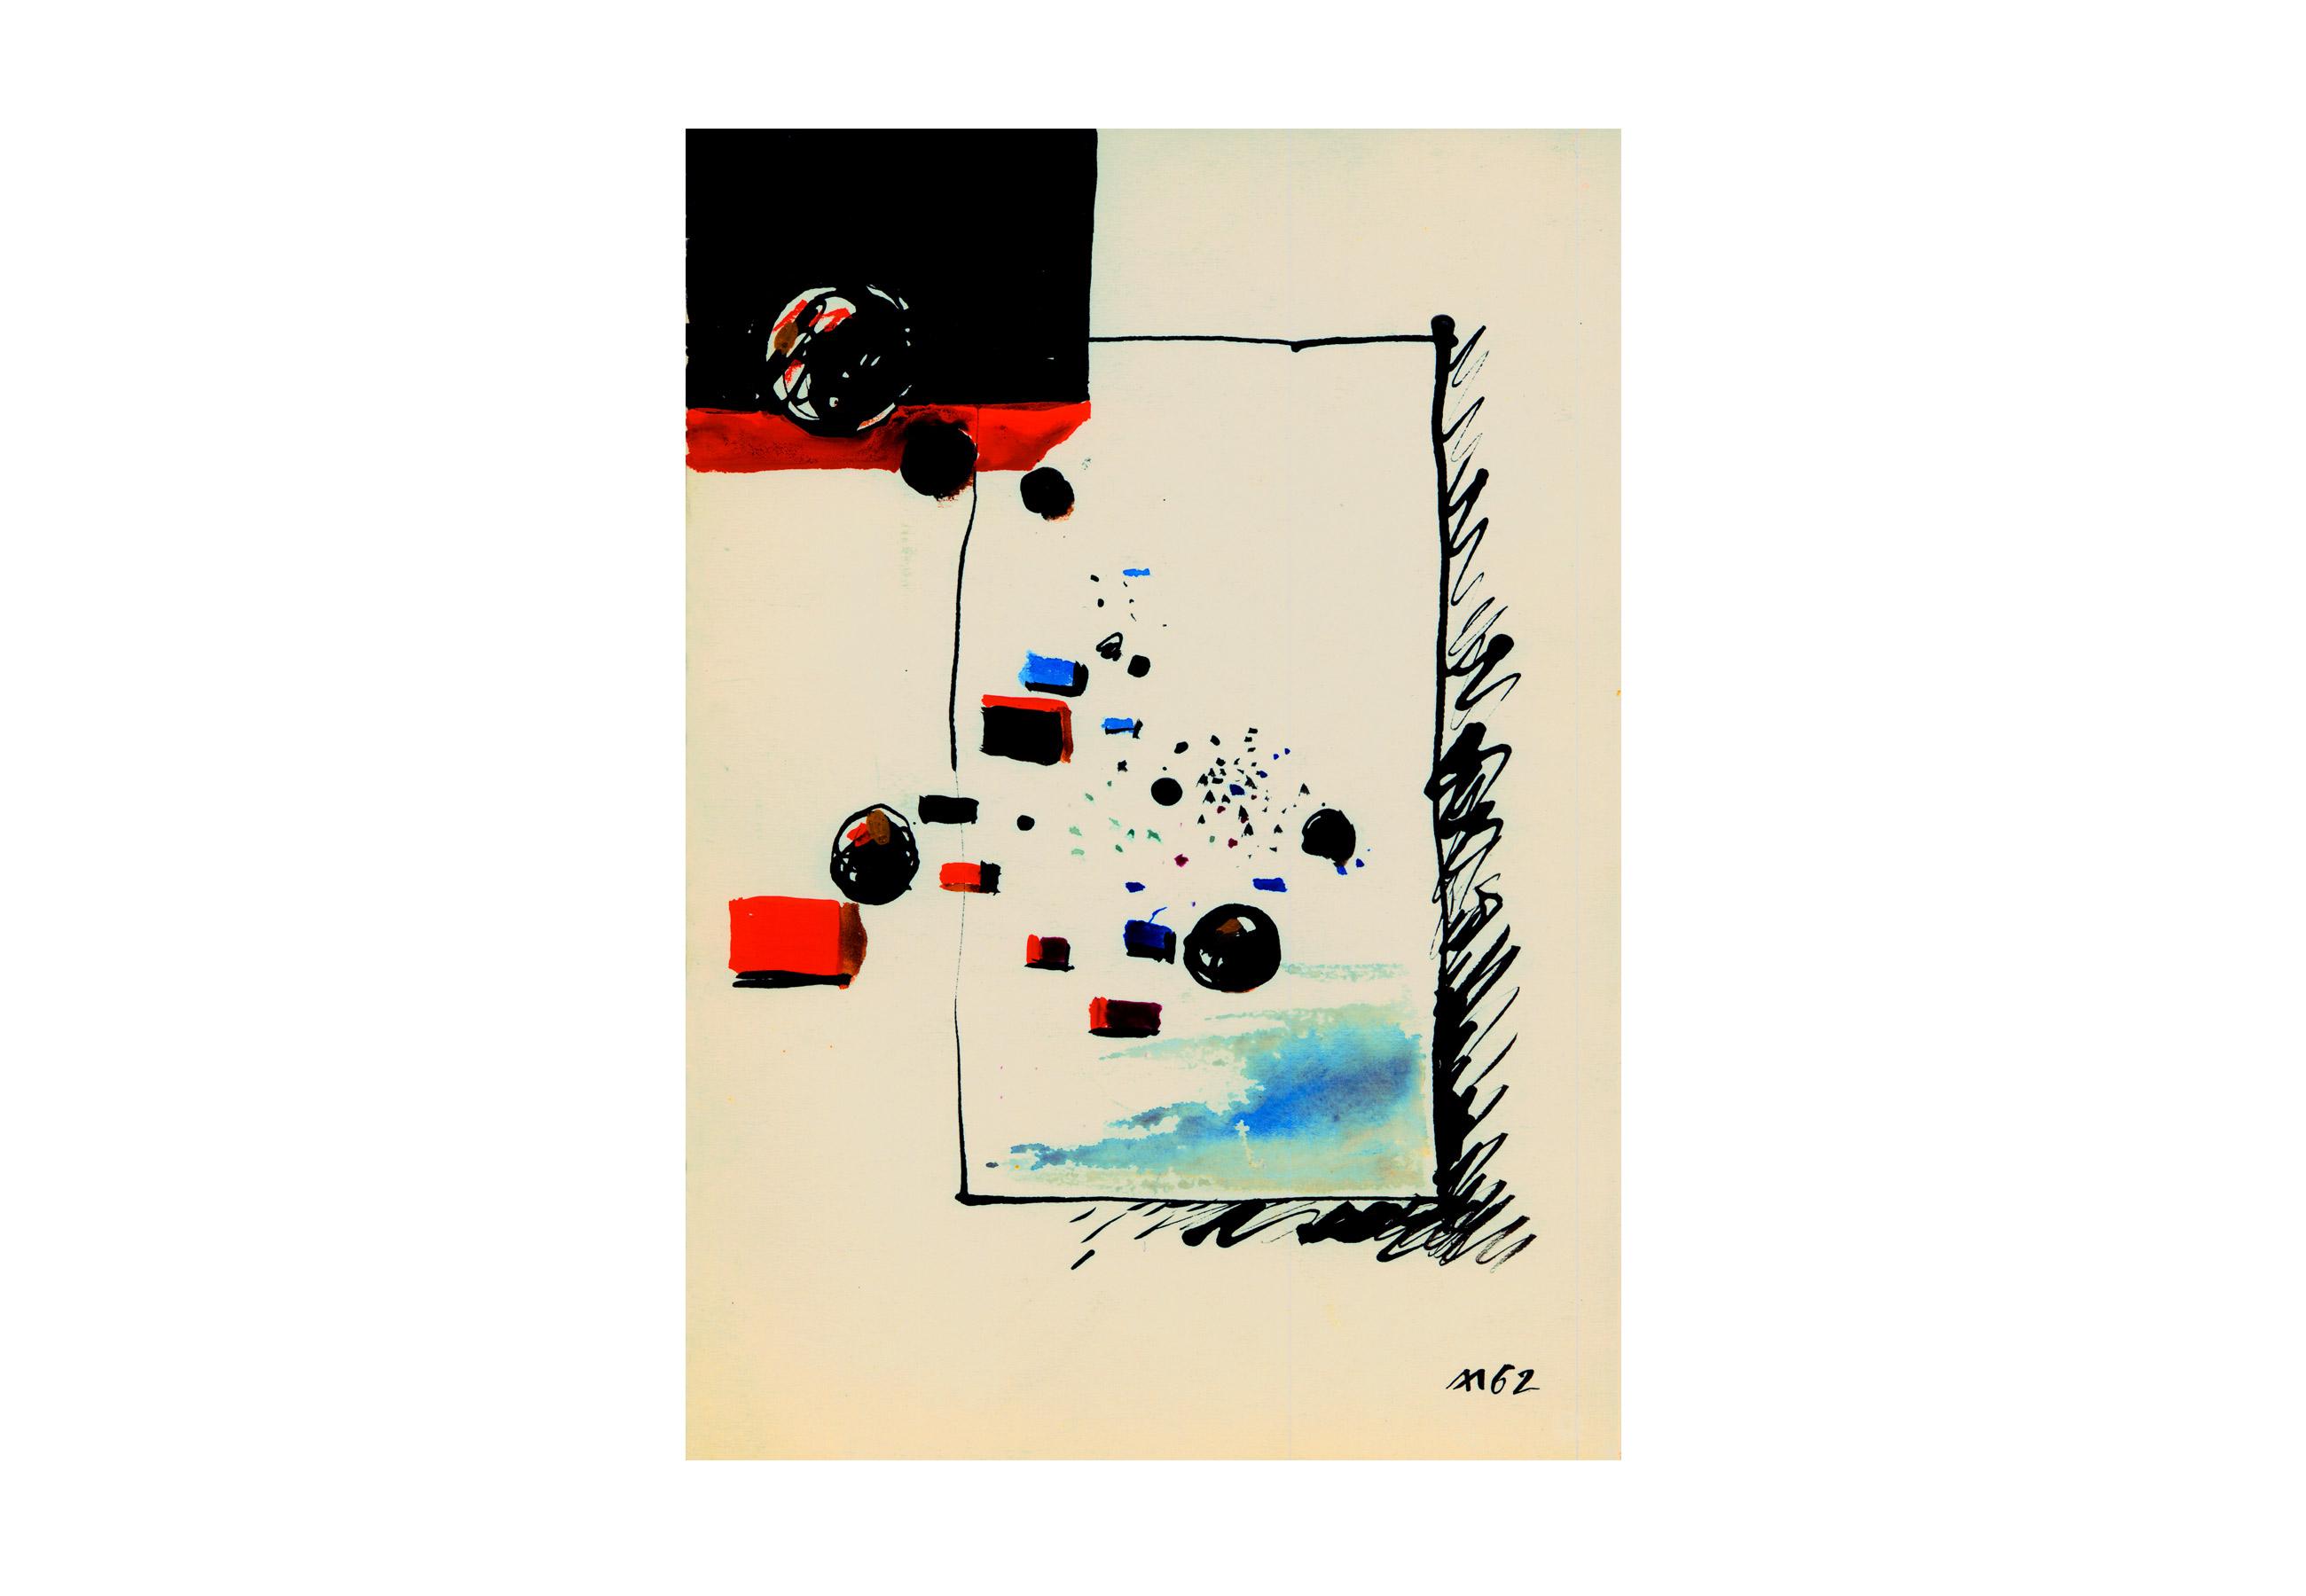 Lamm-Portfolio-1960-69-17.jpg